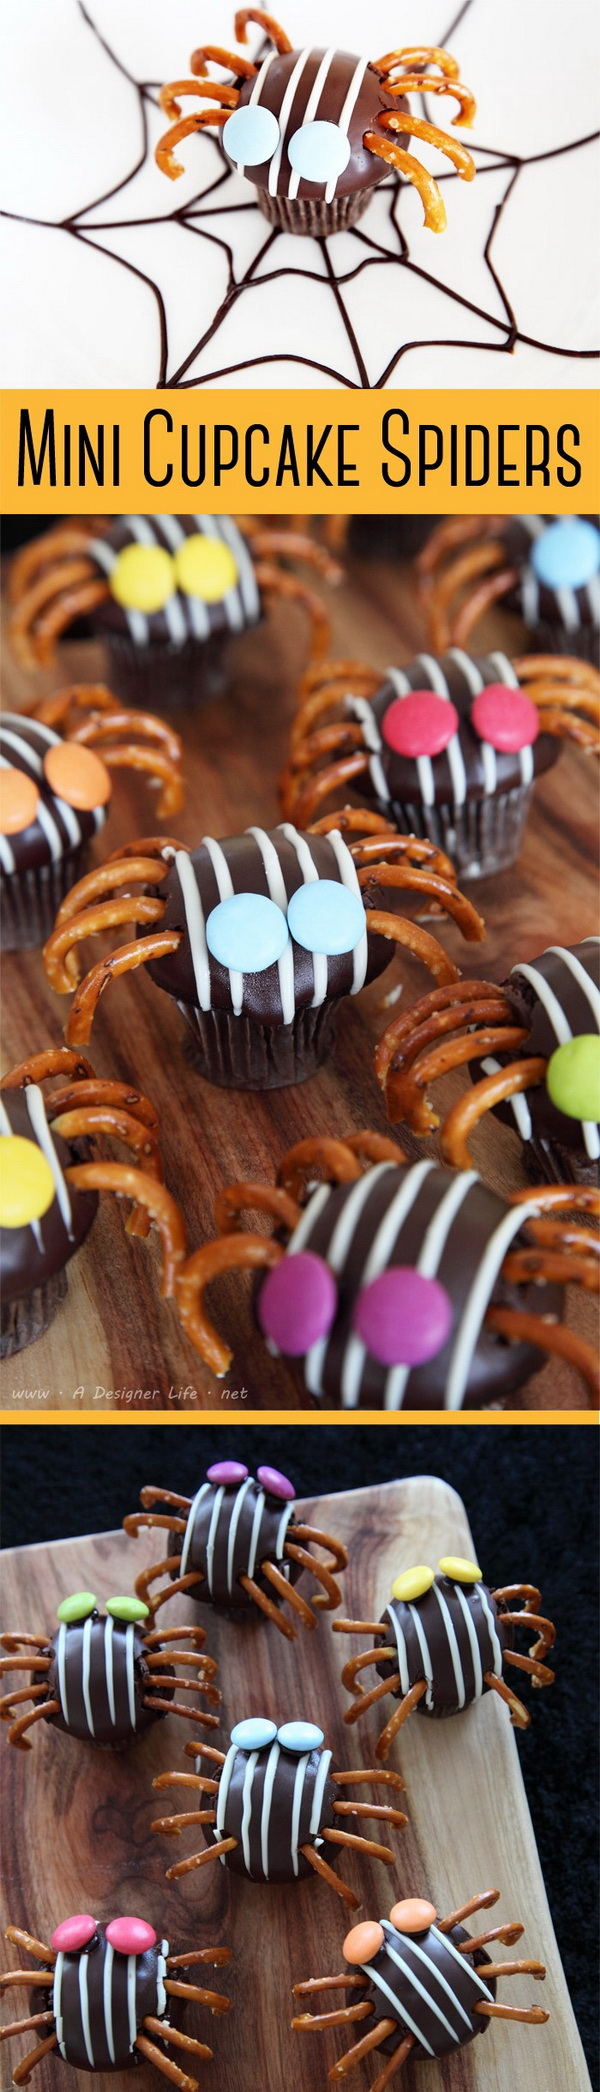 Mini Cupcake Spiders with Pretzel.